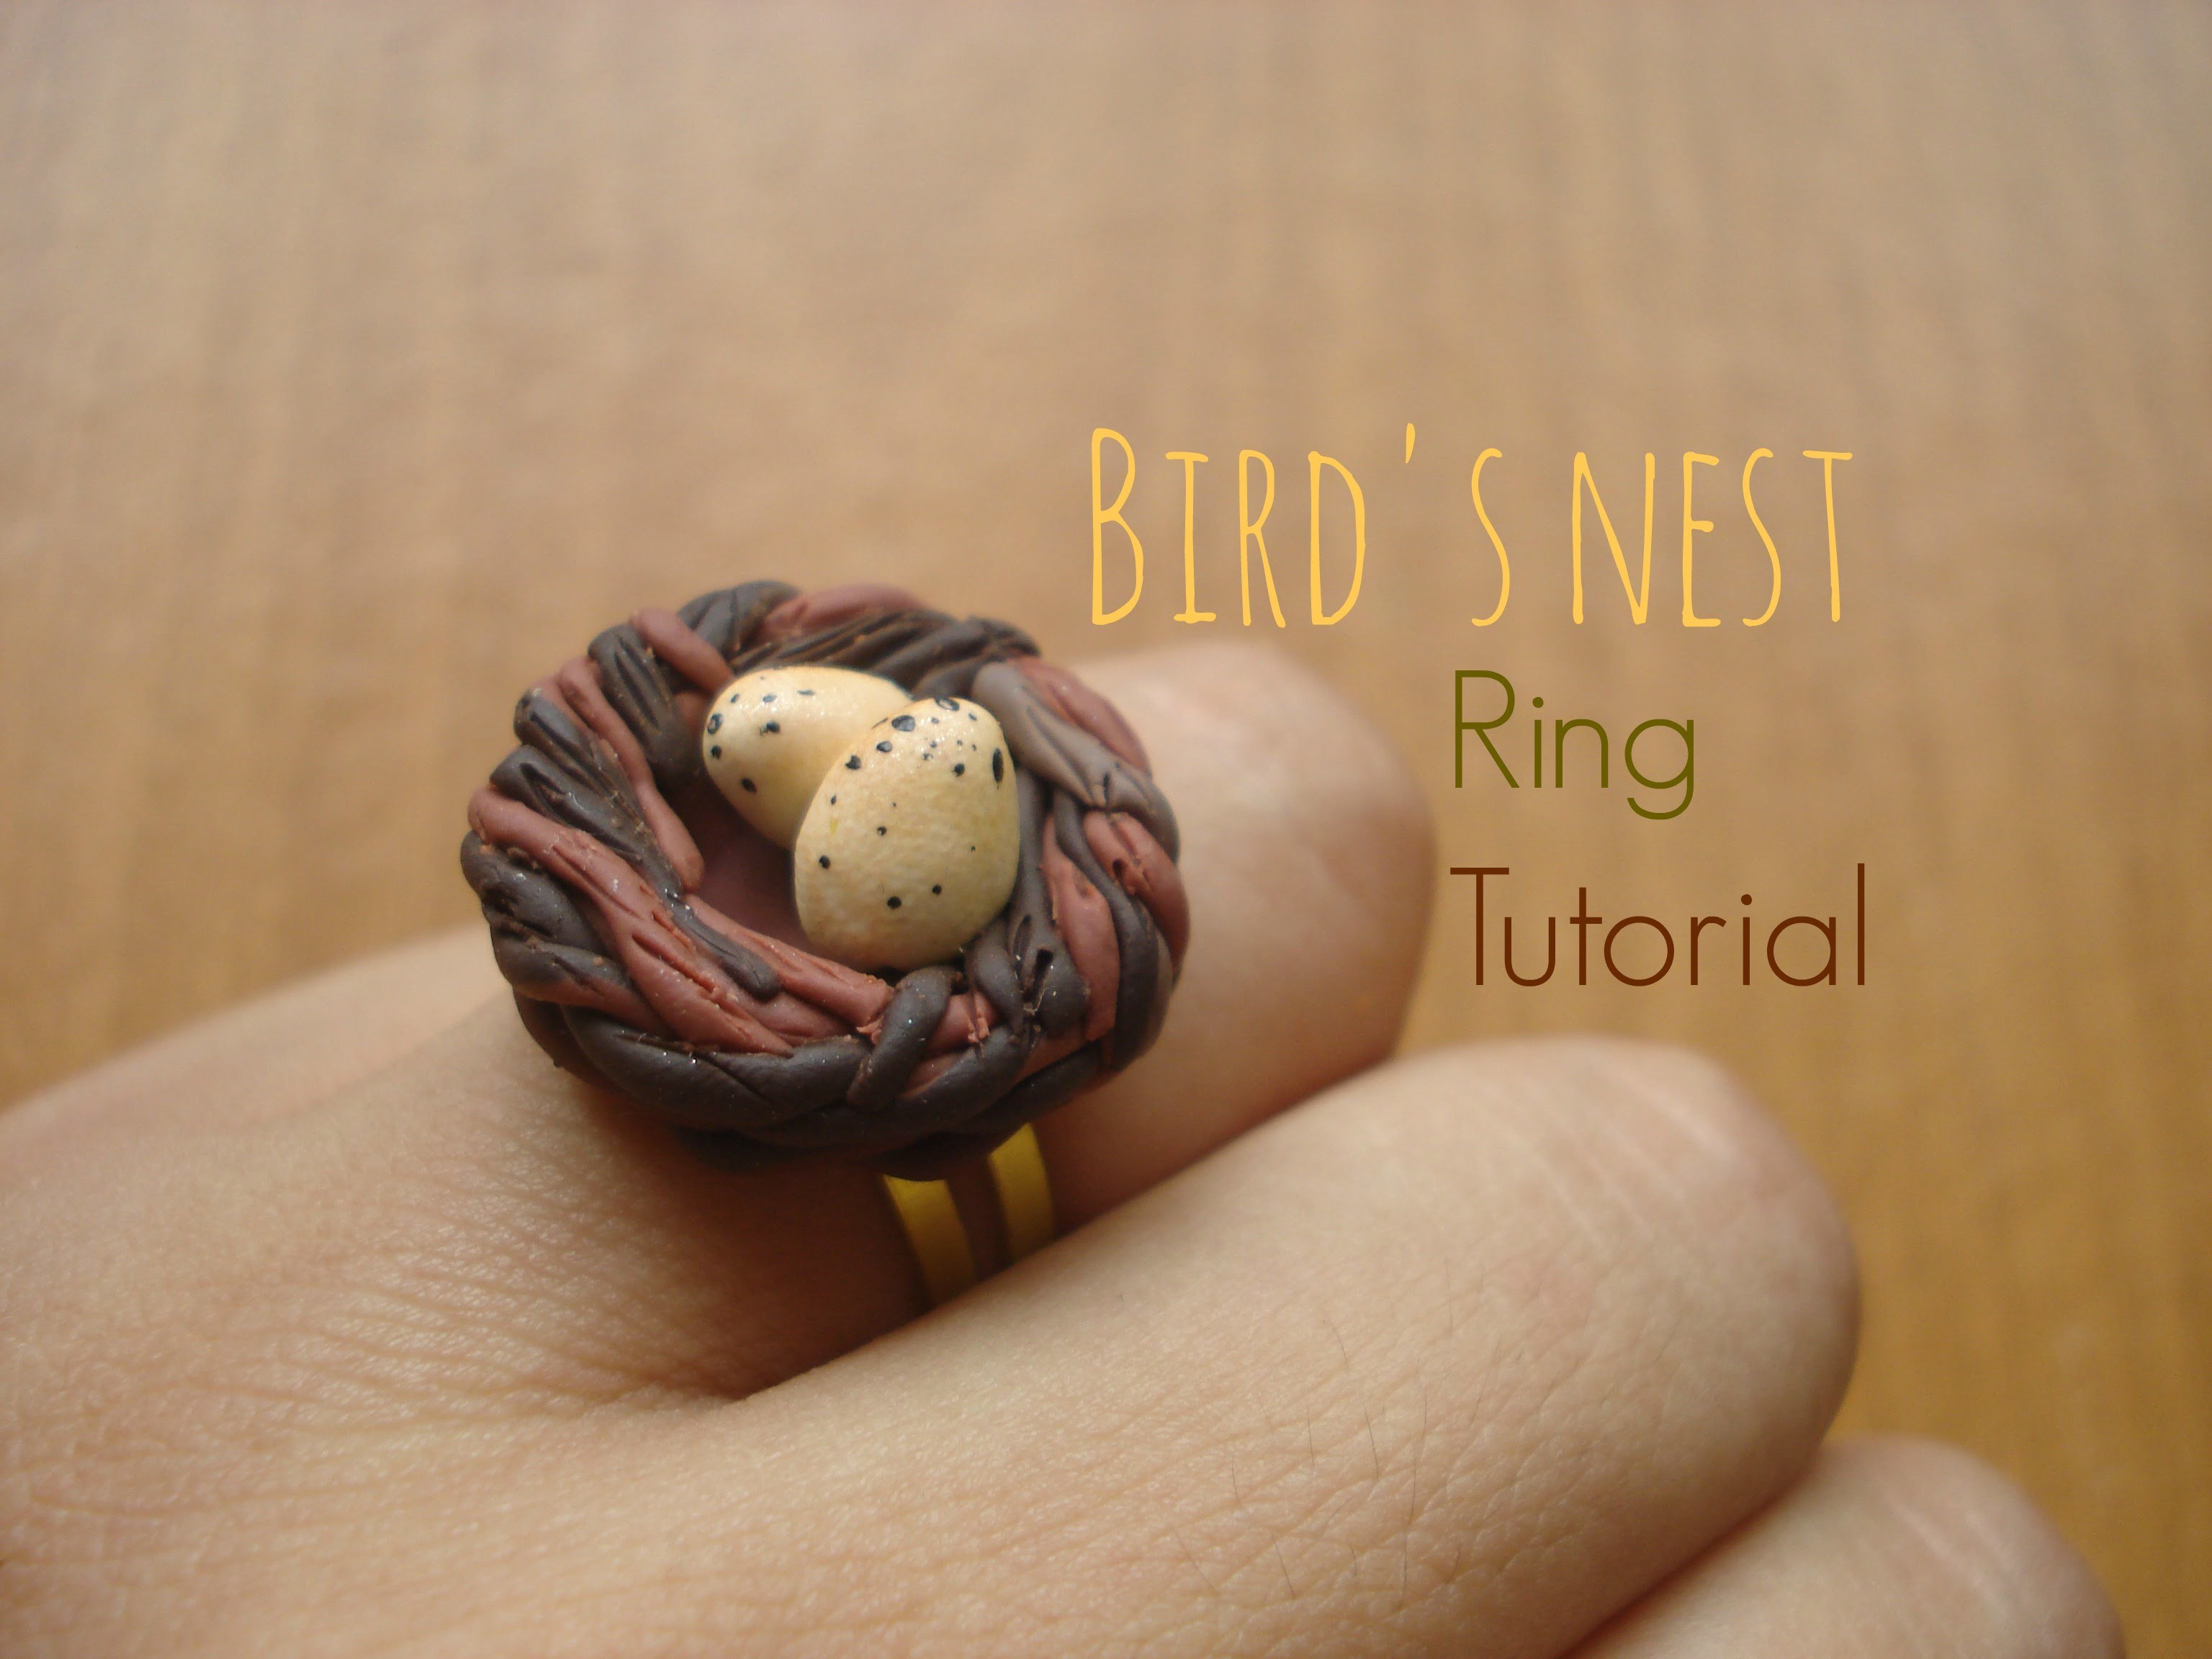 Bird's nest ring tutorial - polymer clay